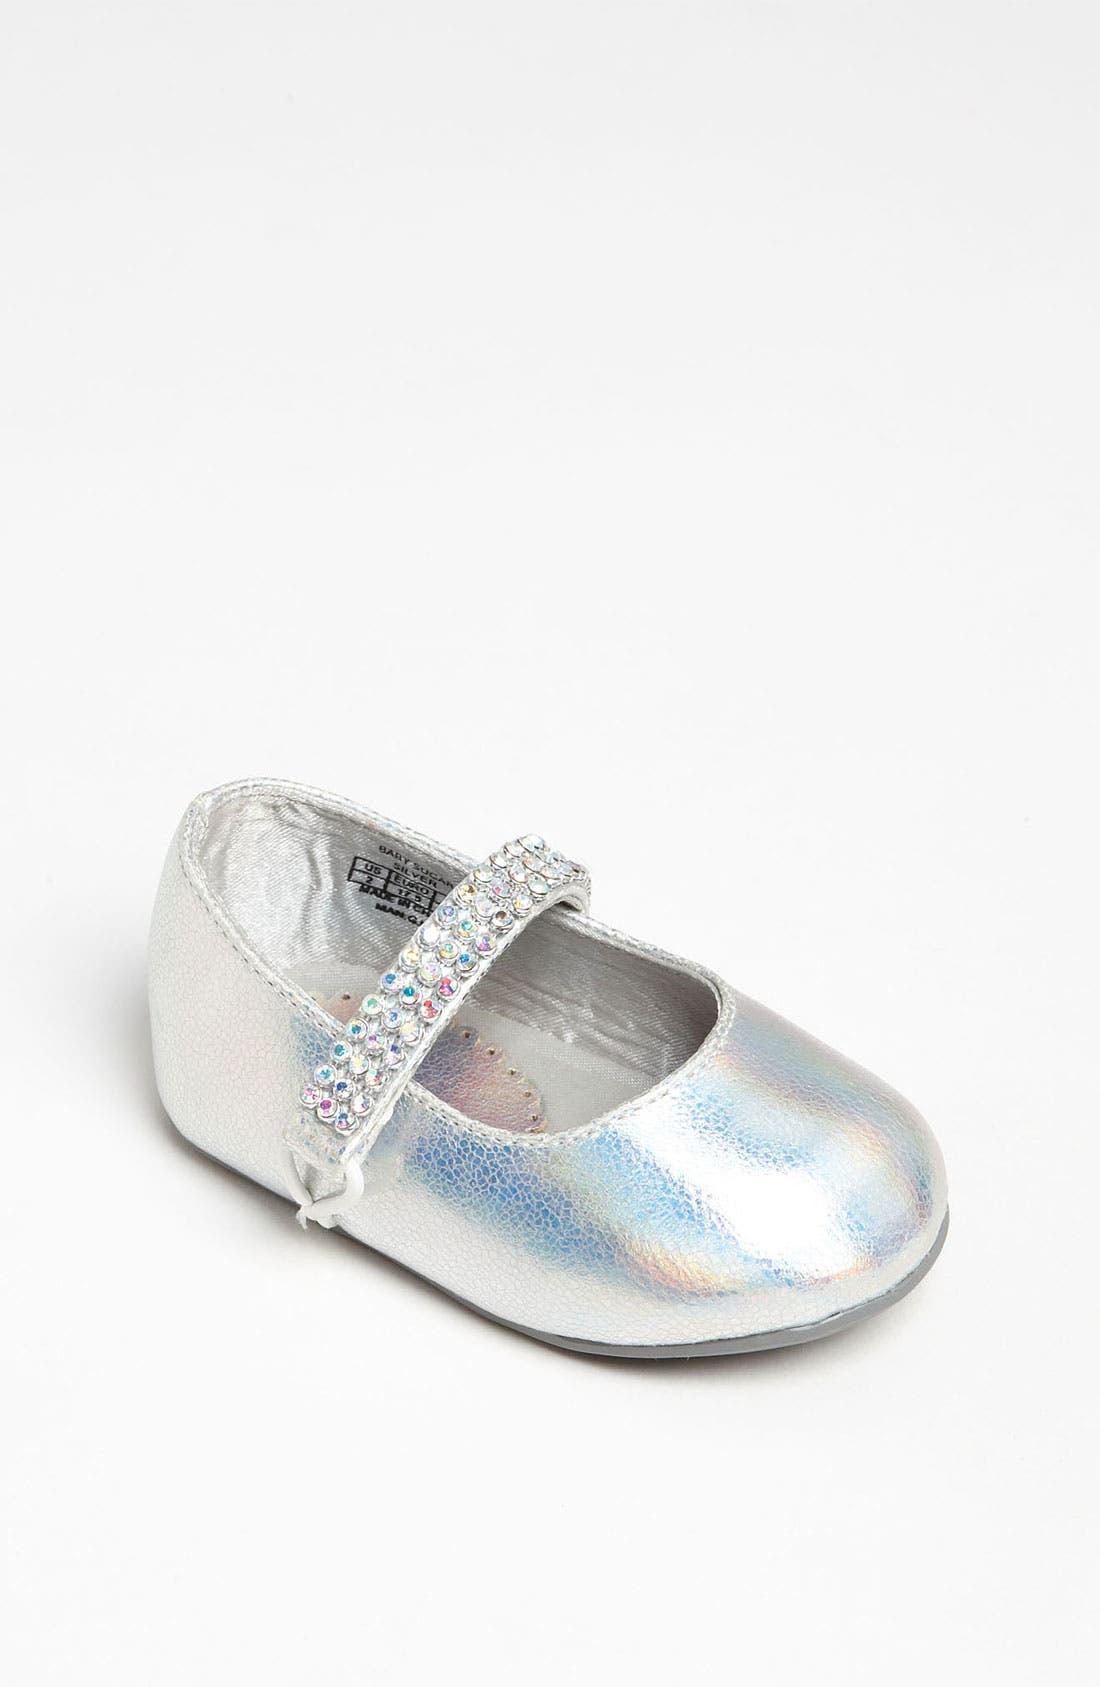 Alternate Image 1 Selected - Stuart Weitzman 'Baby Sugar' Crib Shoe (Baby)